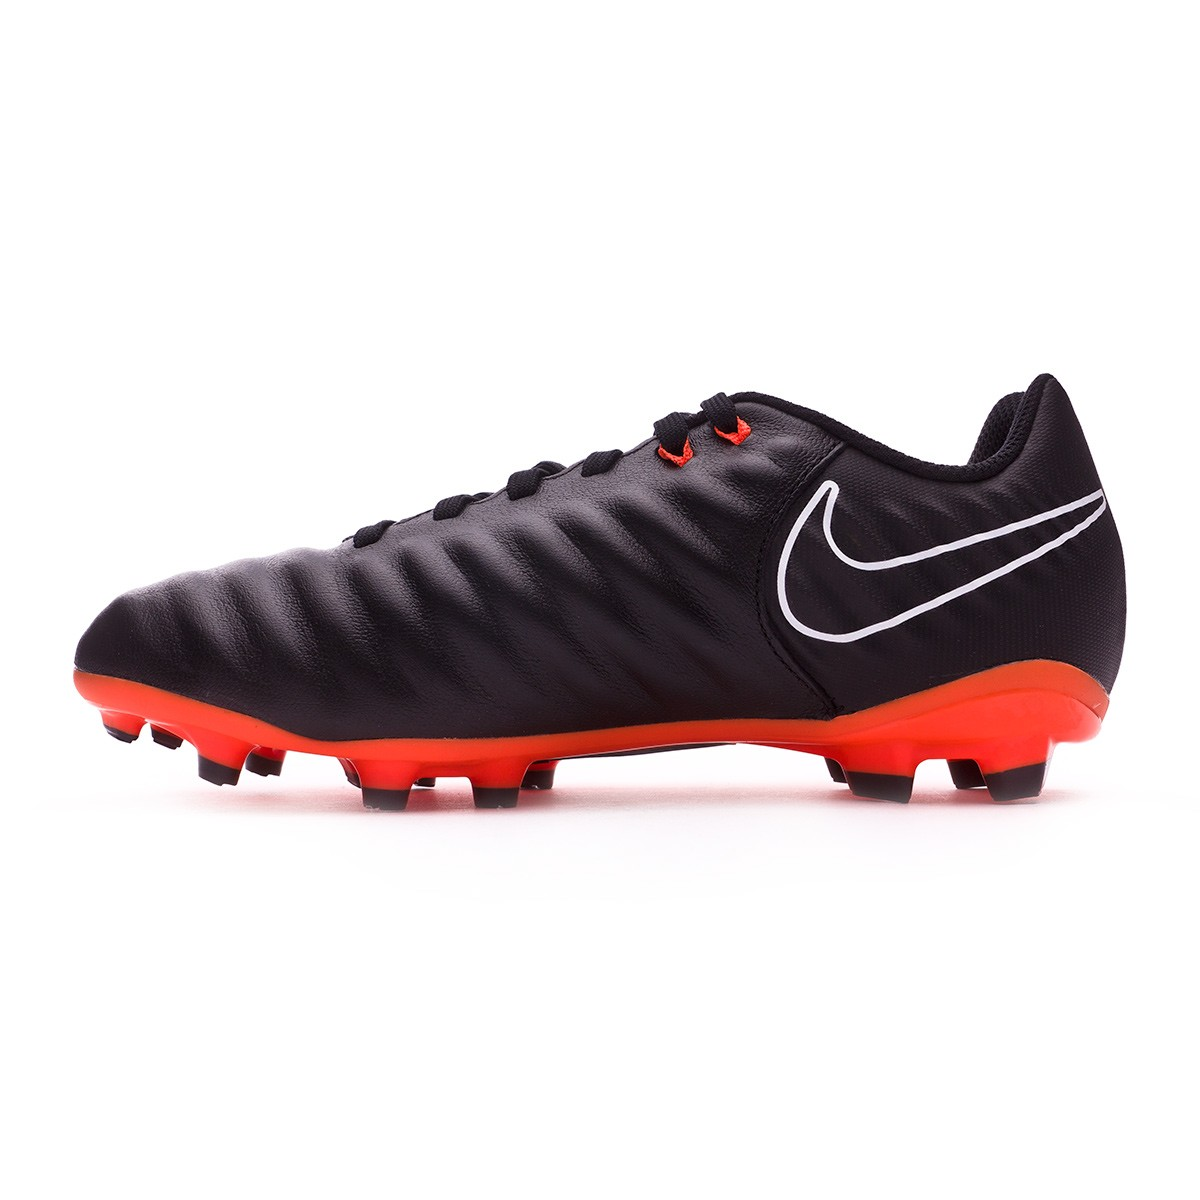 Bota de fútbol Nike Tiempo Legend VII Academy FG Niño Black Total